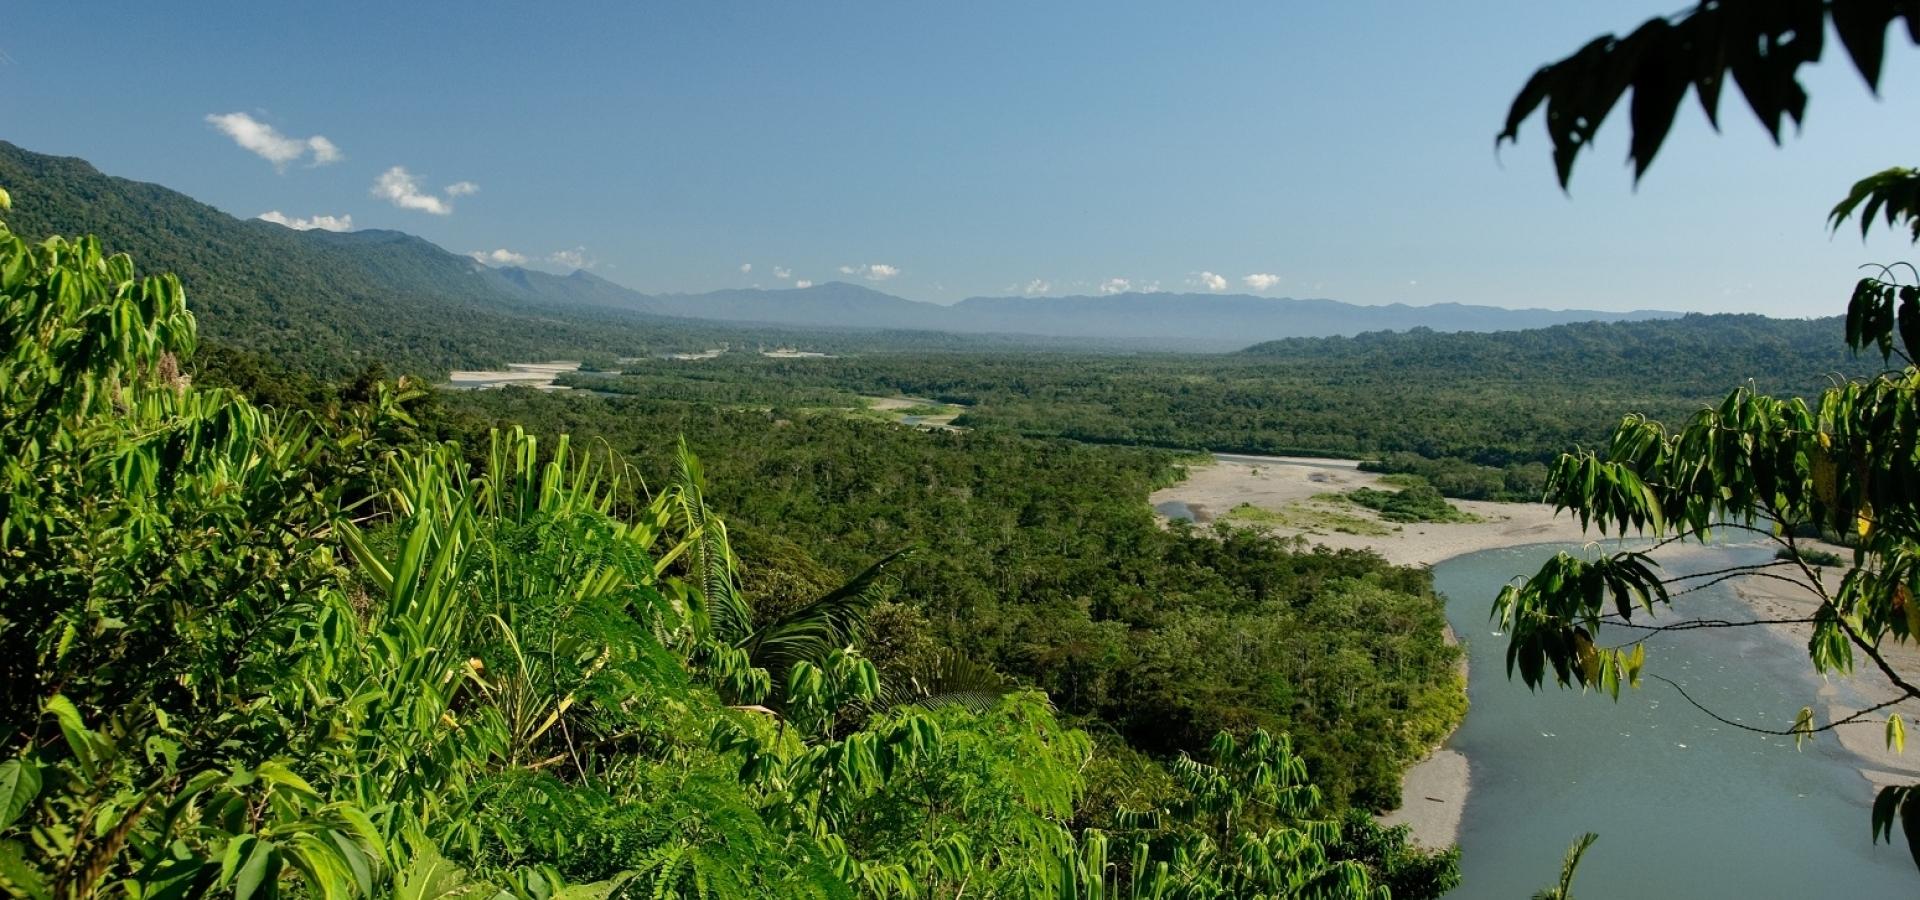 Peru Naturaleza - Eco-Aventuras Parque Nacional del Manu